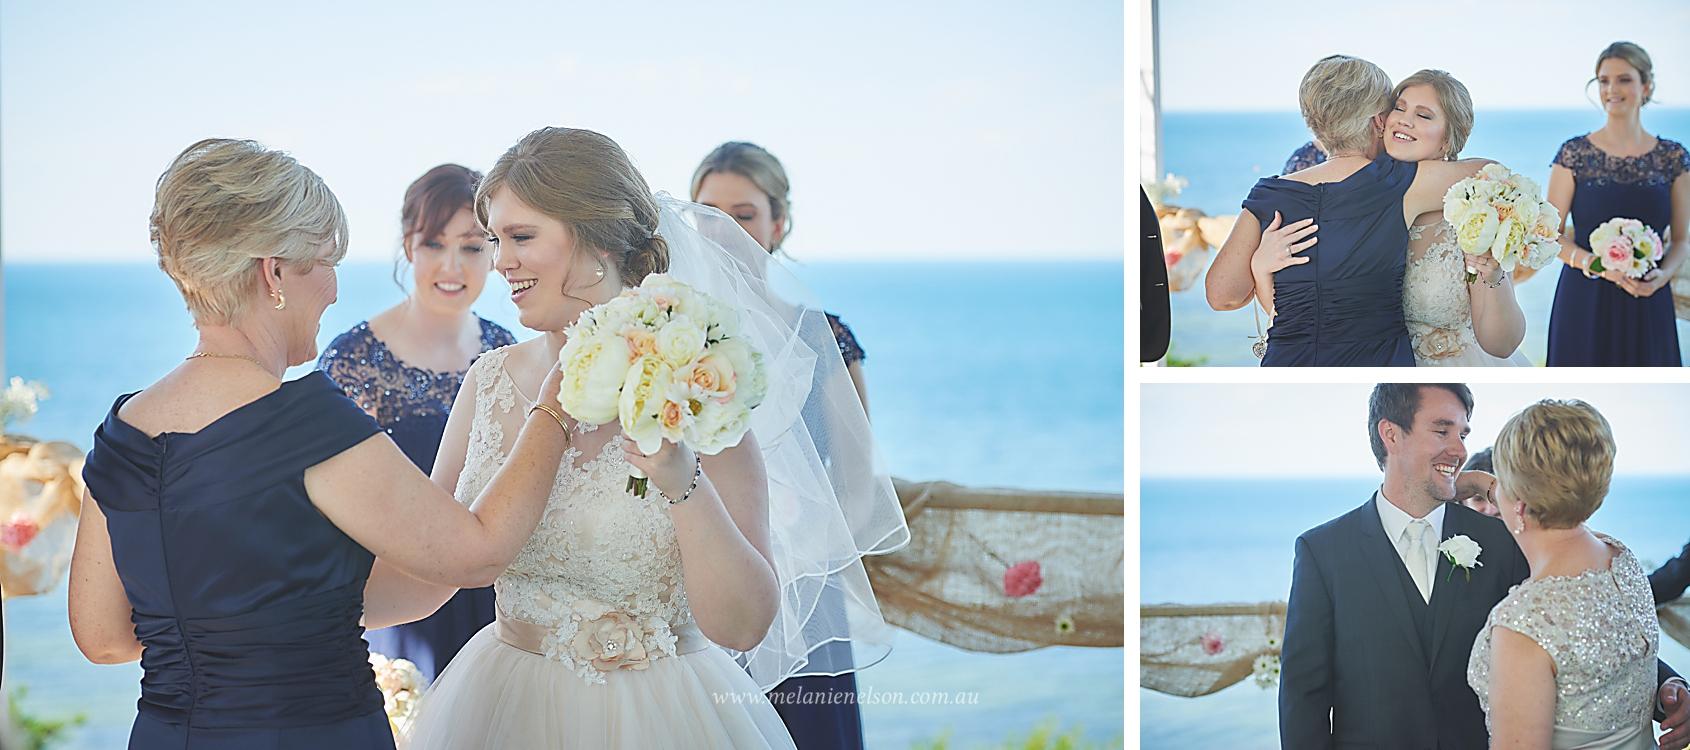 yorke_peninsula_wedding_photographer_0046.jpg